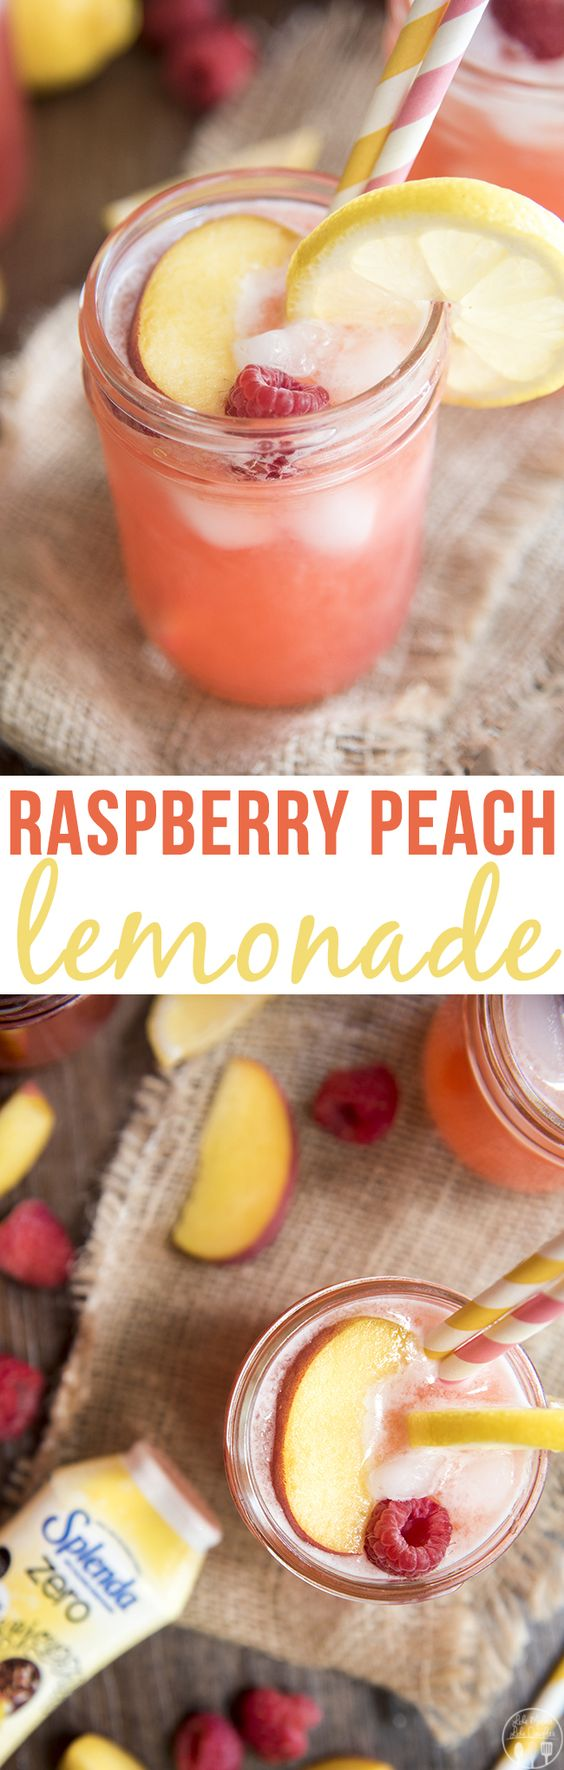 Raspberry Peach Lemonade - This lemonade is full of fresh raspberries ...